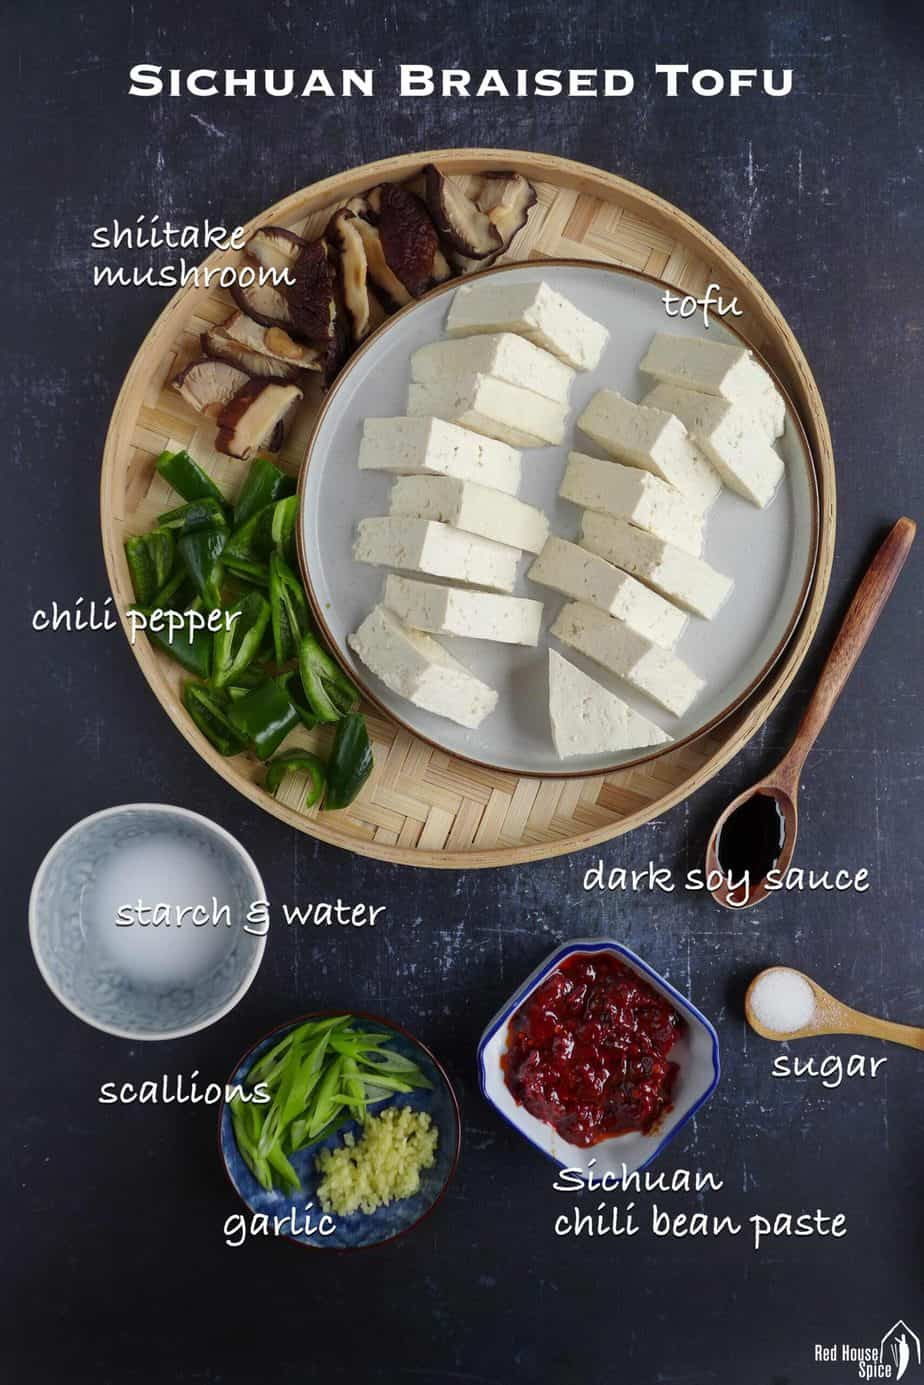 Ingredients for making Sichuan braised tofu